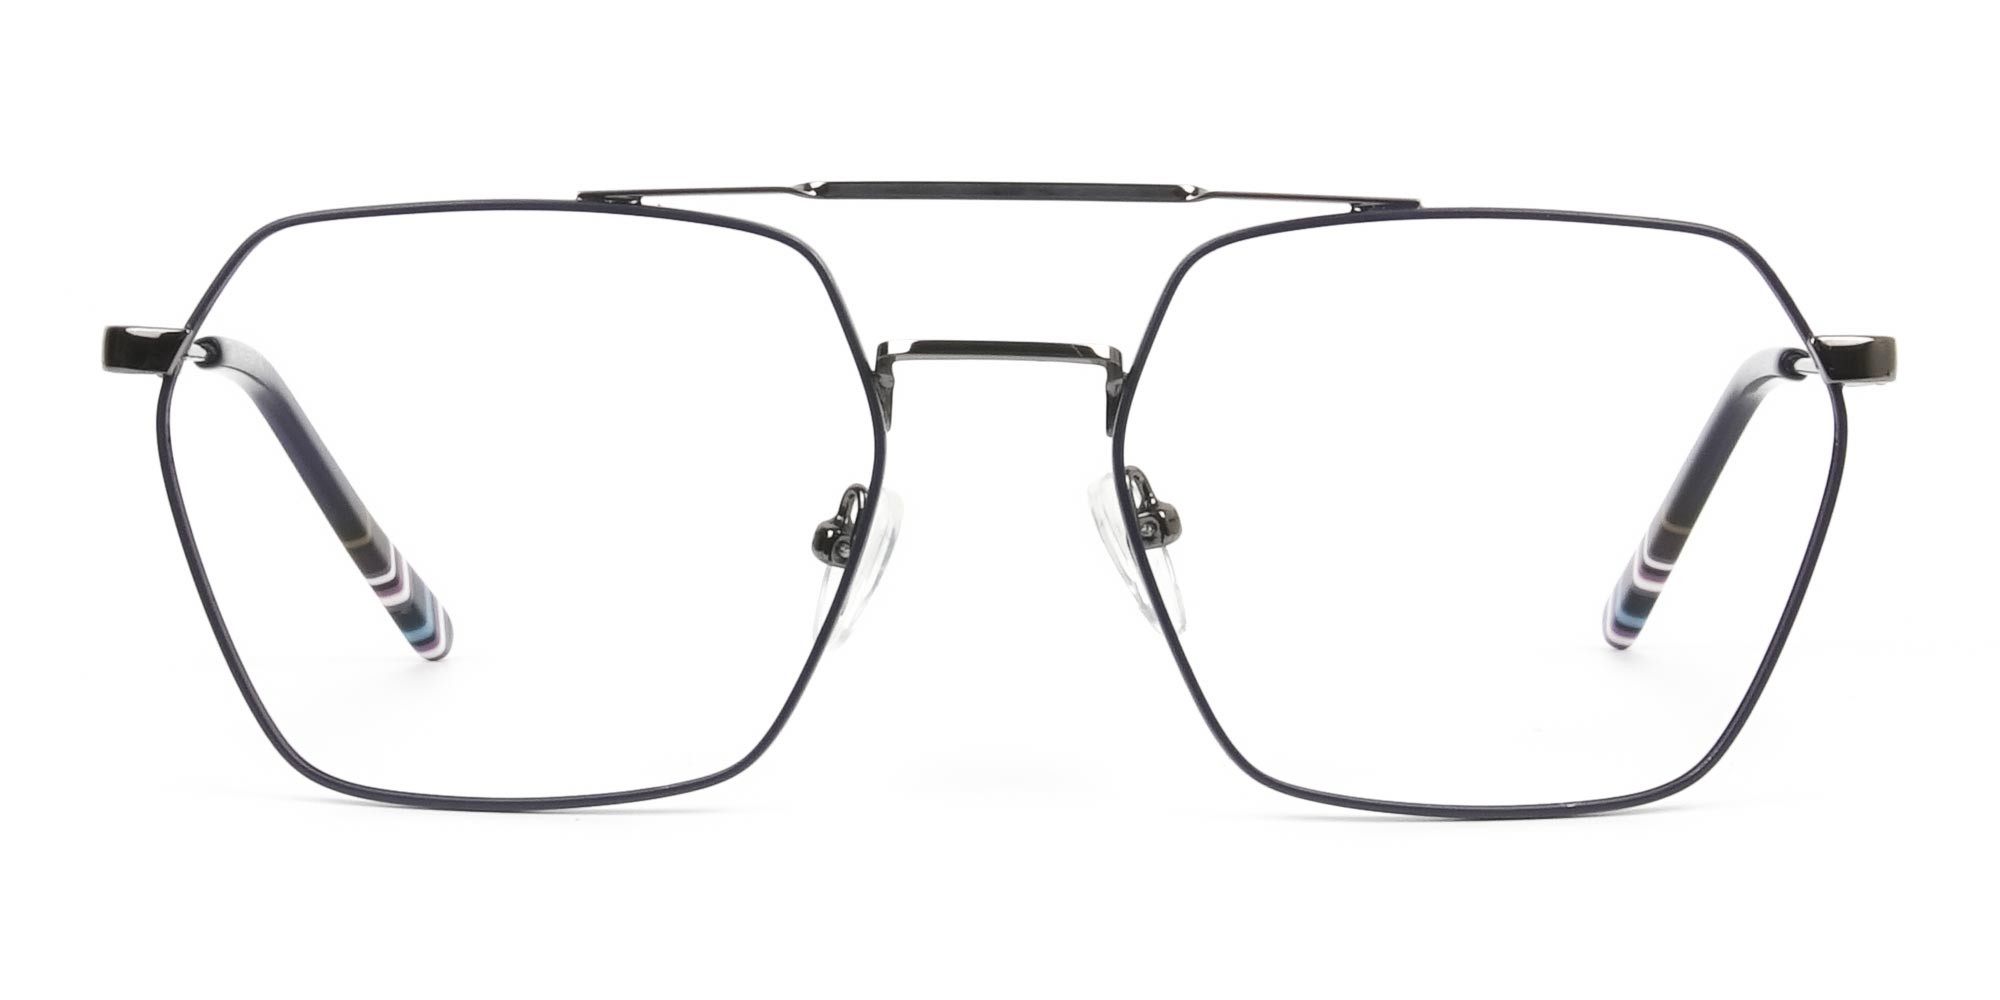 Dark Navy & Gunmetal Thin Metal Glasses - 1